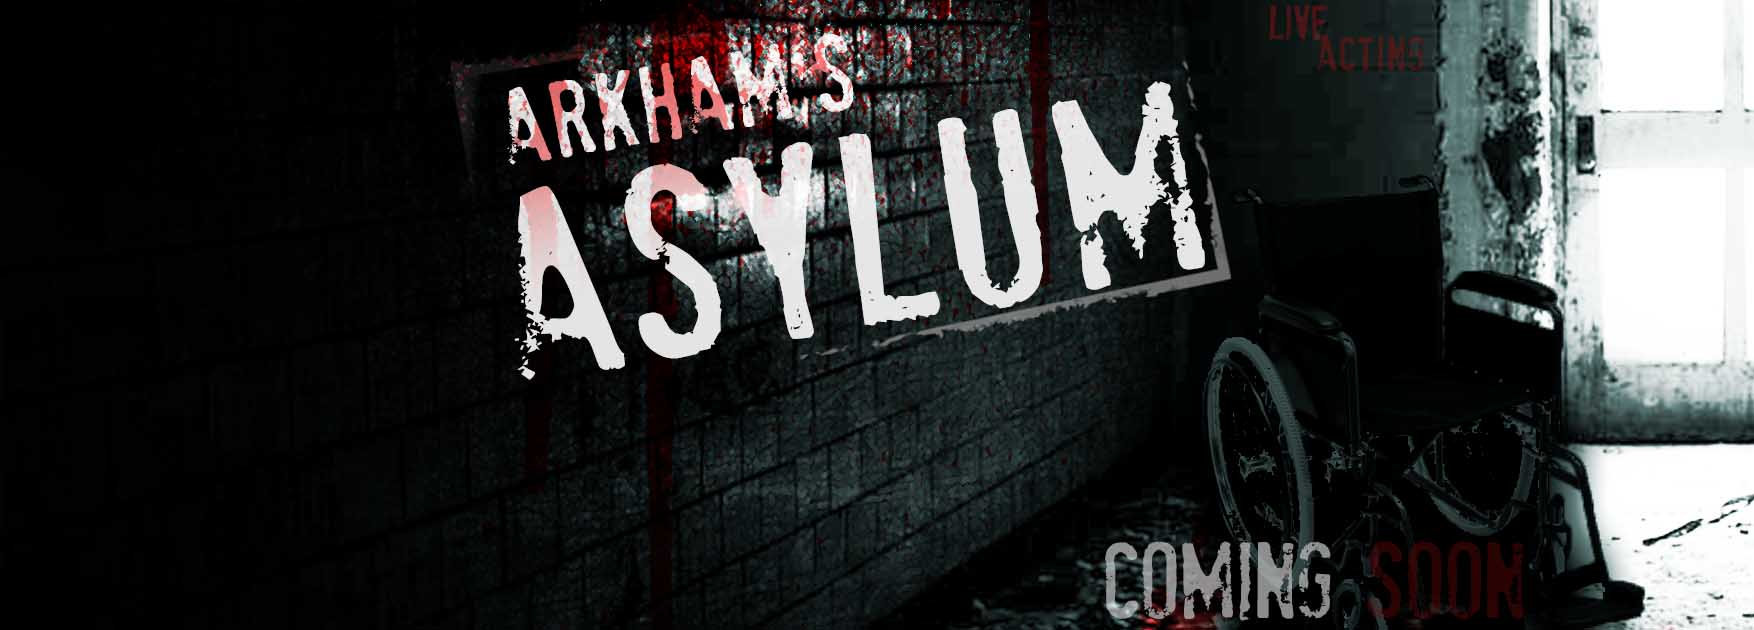 1 asylum strip horror  - arkham escape room rooms athens greece αθηνα ελλαδα δωματια αποδρασης batman joker riddler